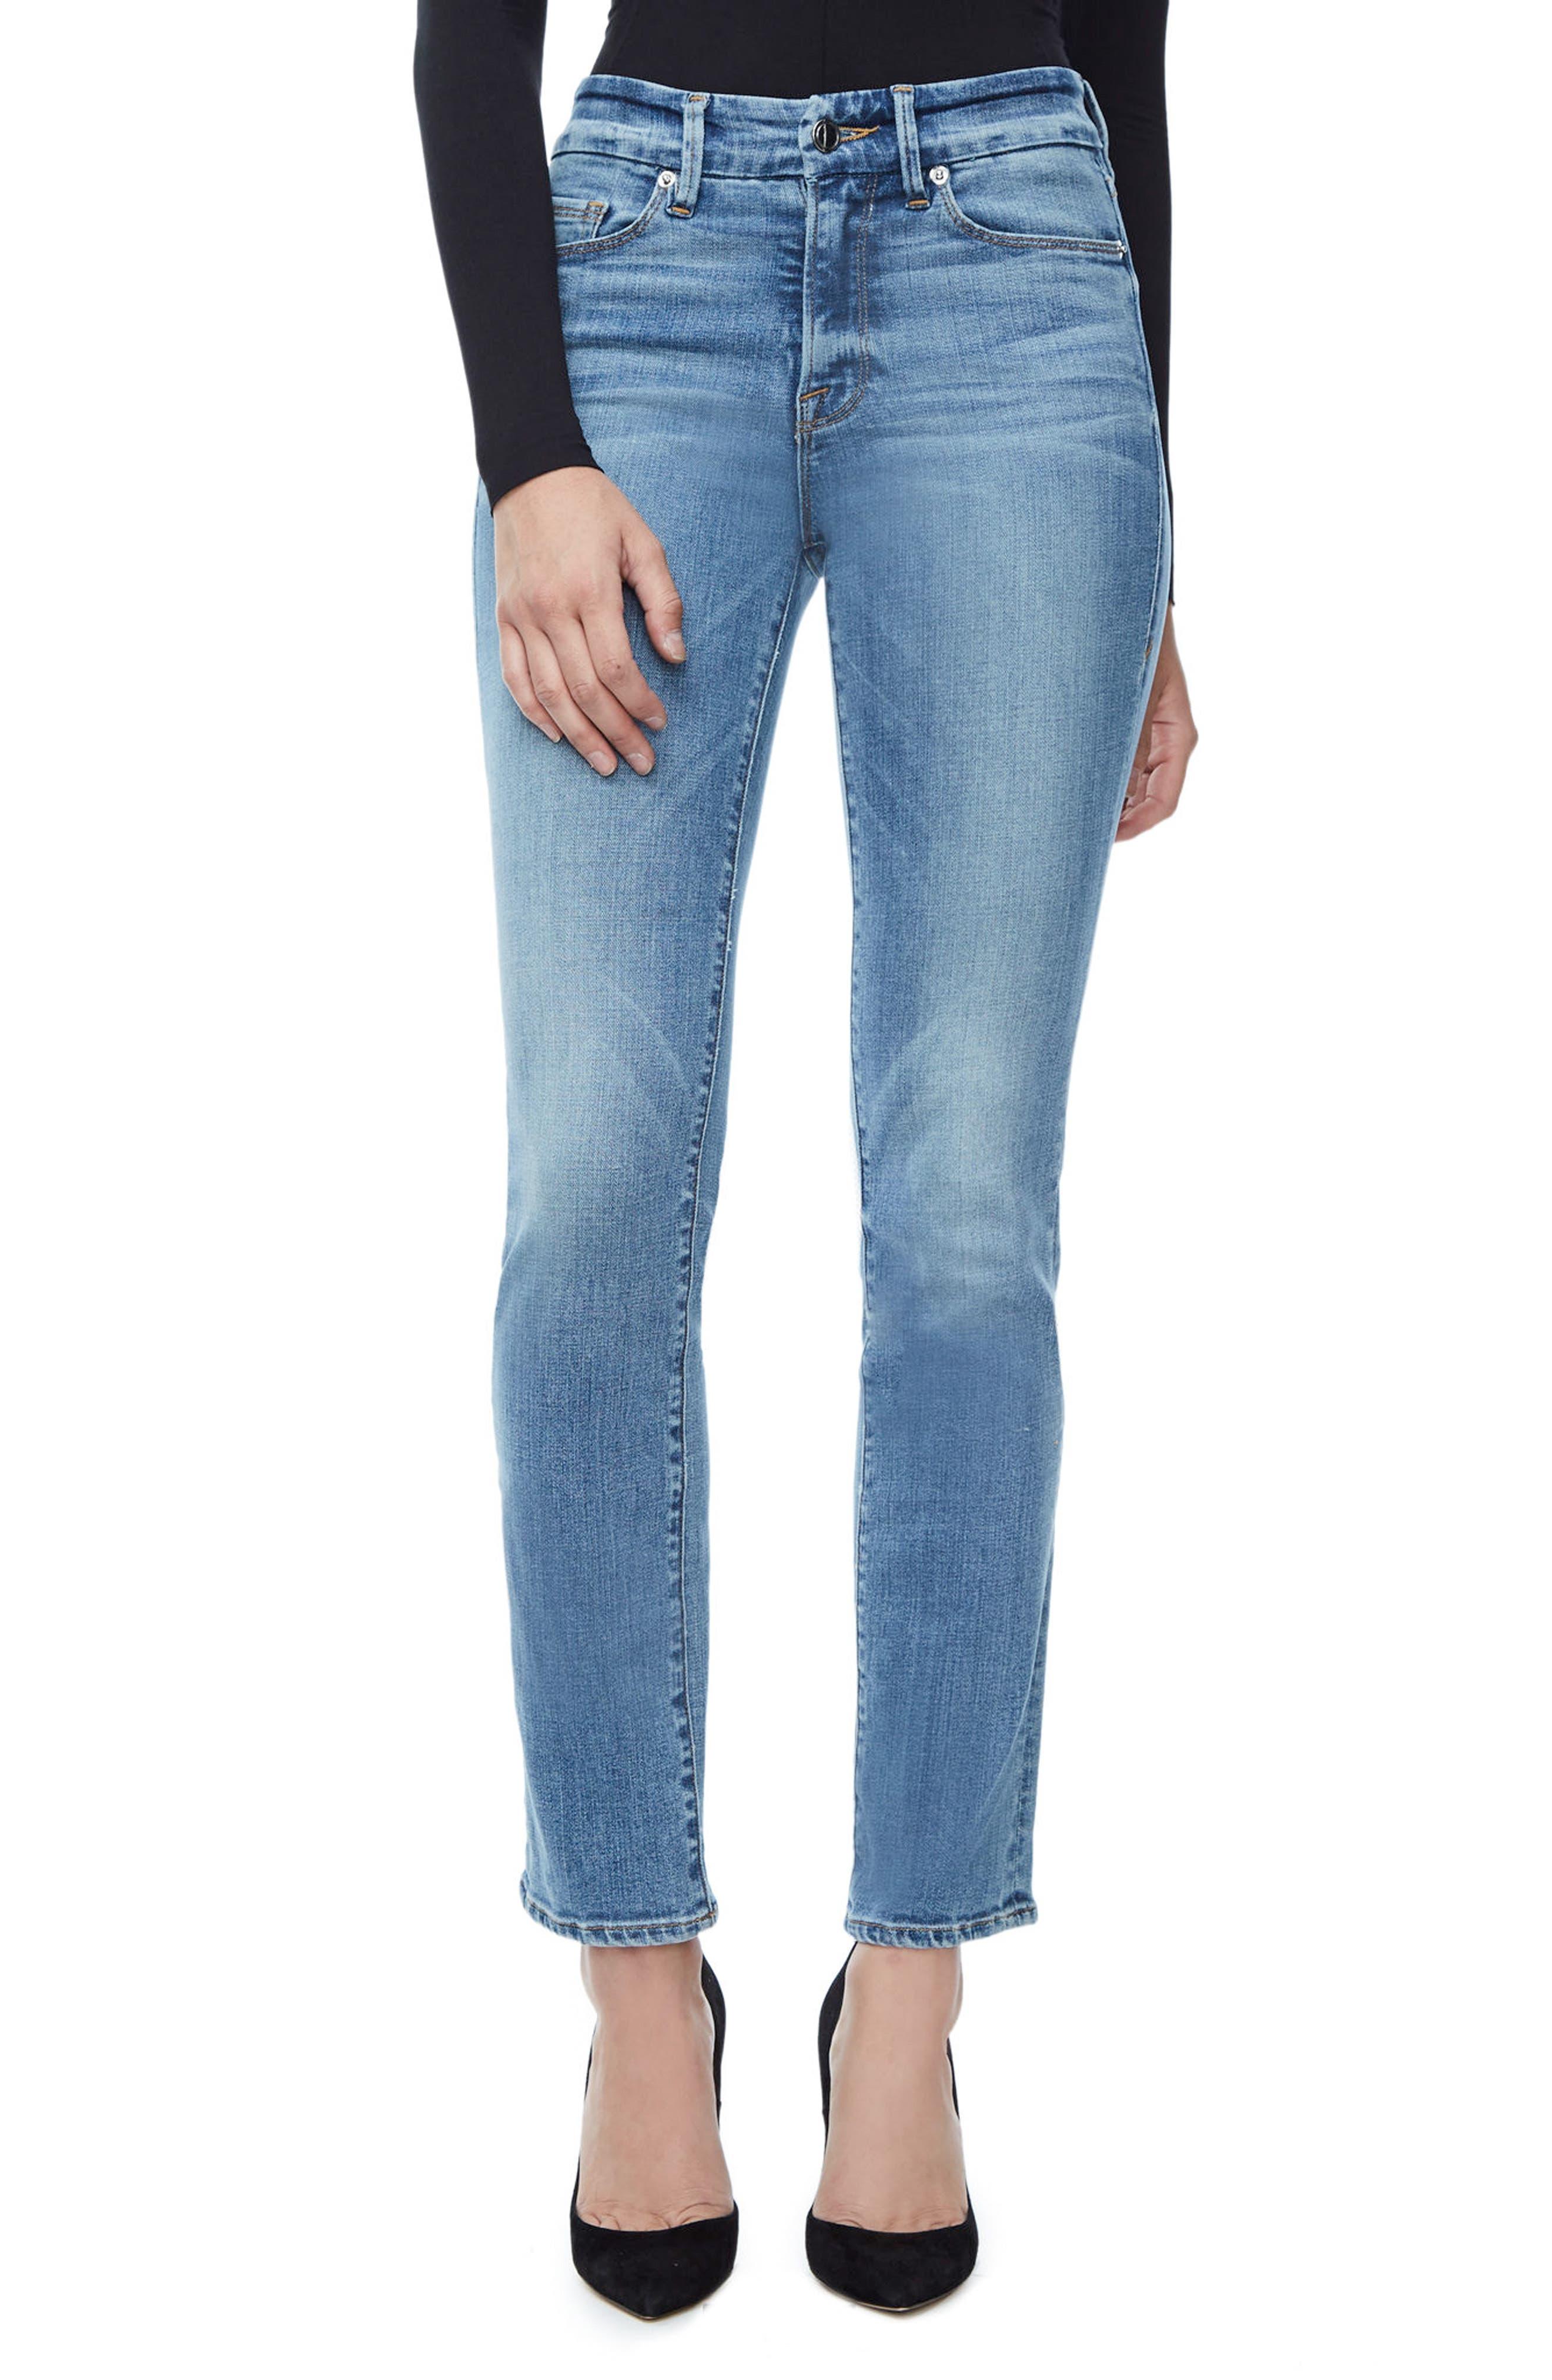 Main Image - Good American Good Straight High Rise Jeans (Blue 087) (Regular & Plus Size)